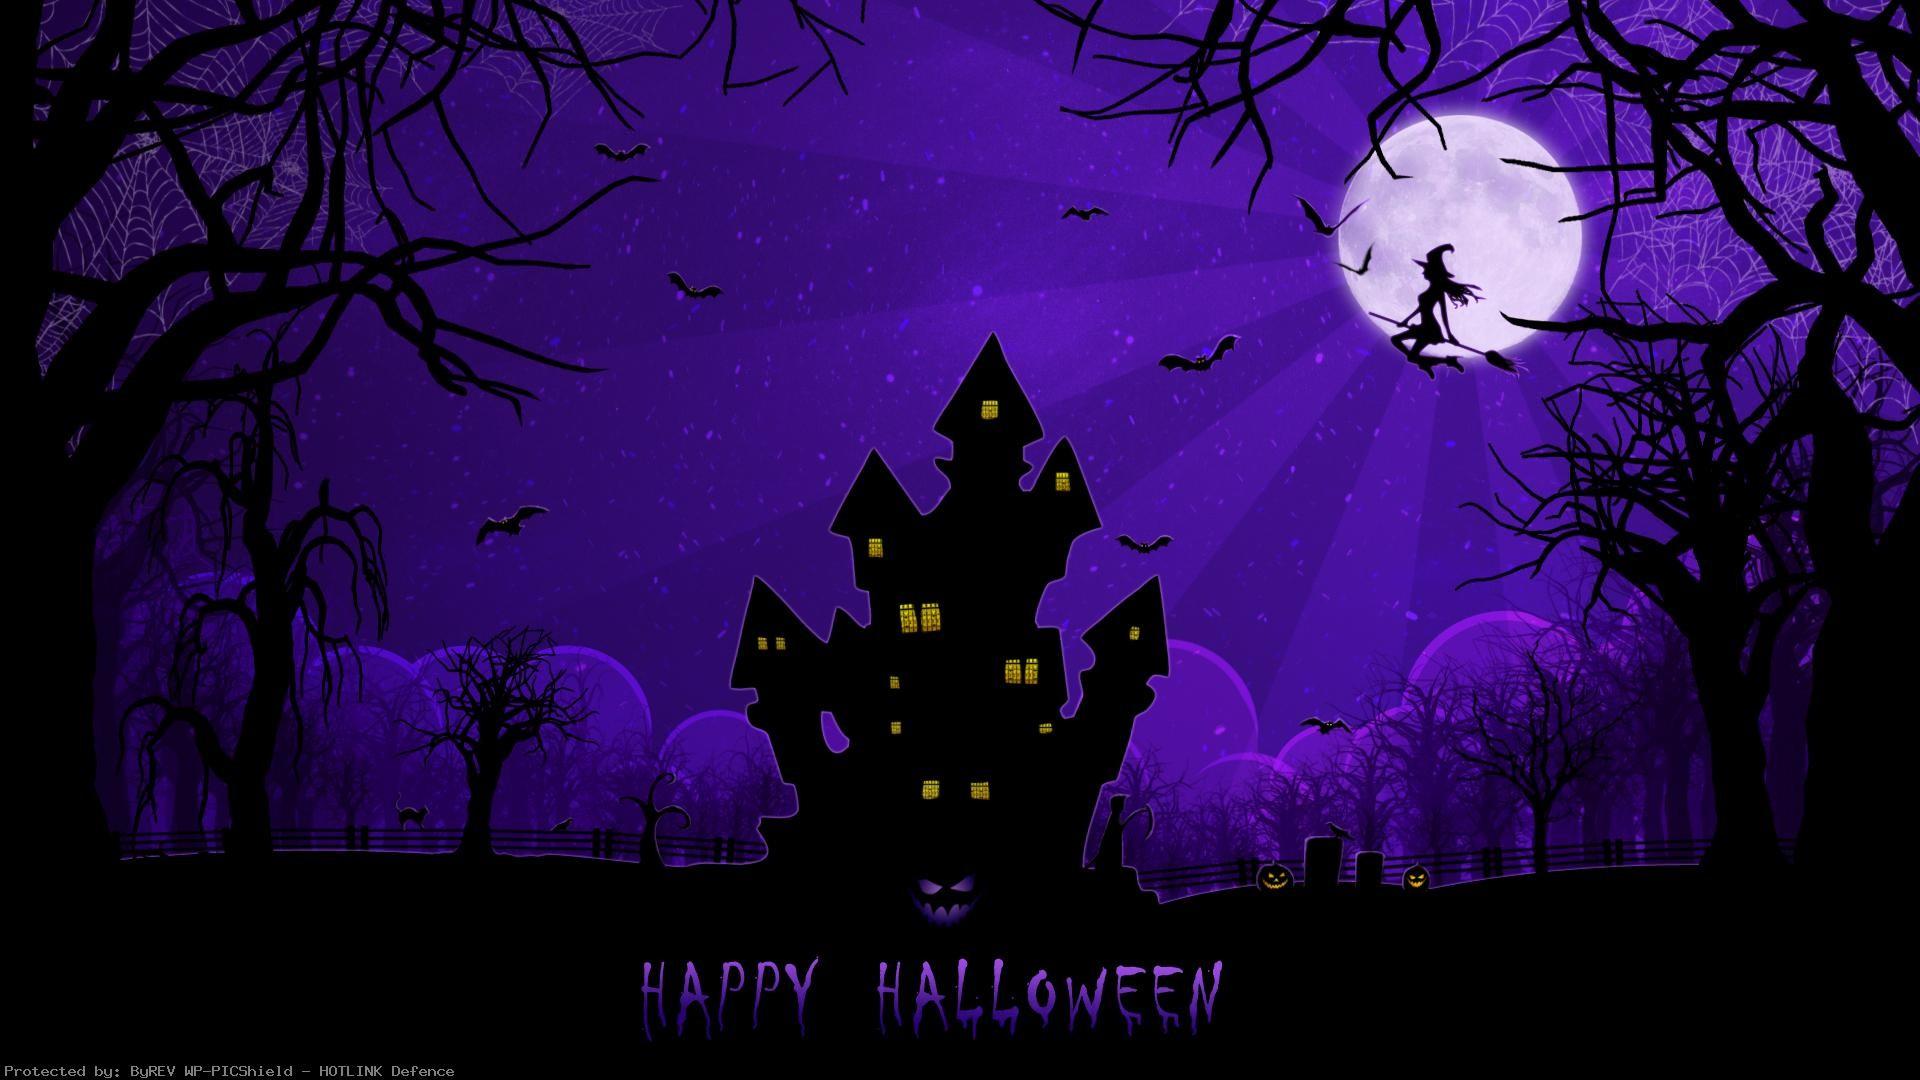 Spooky-Halloween-Images-wallpaper-wp38010403